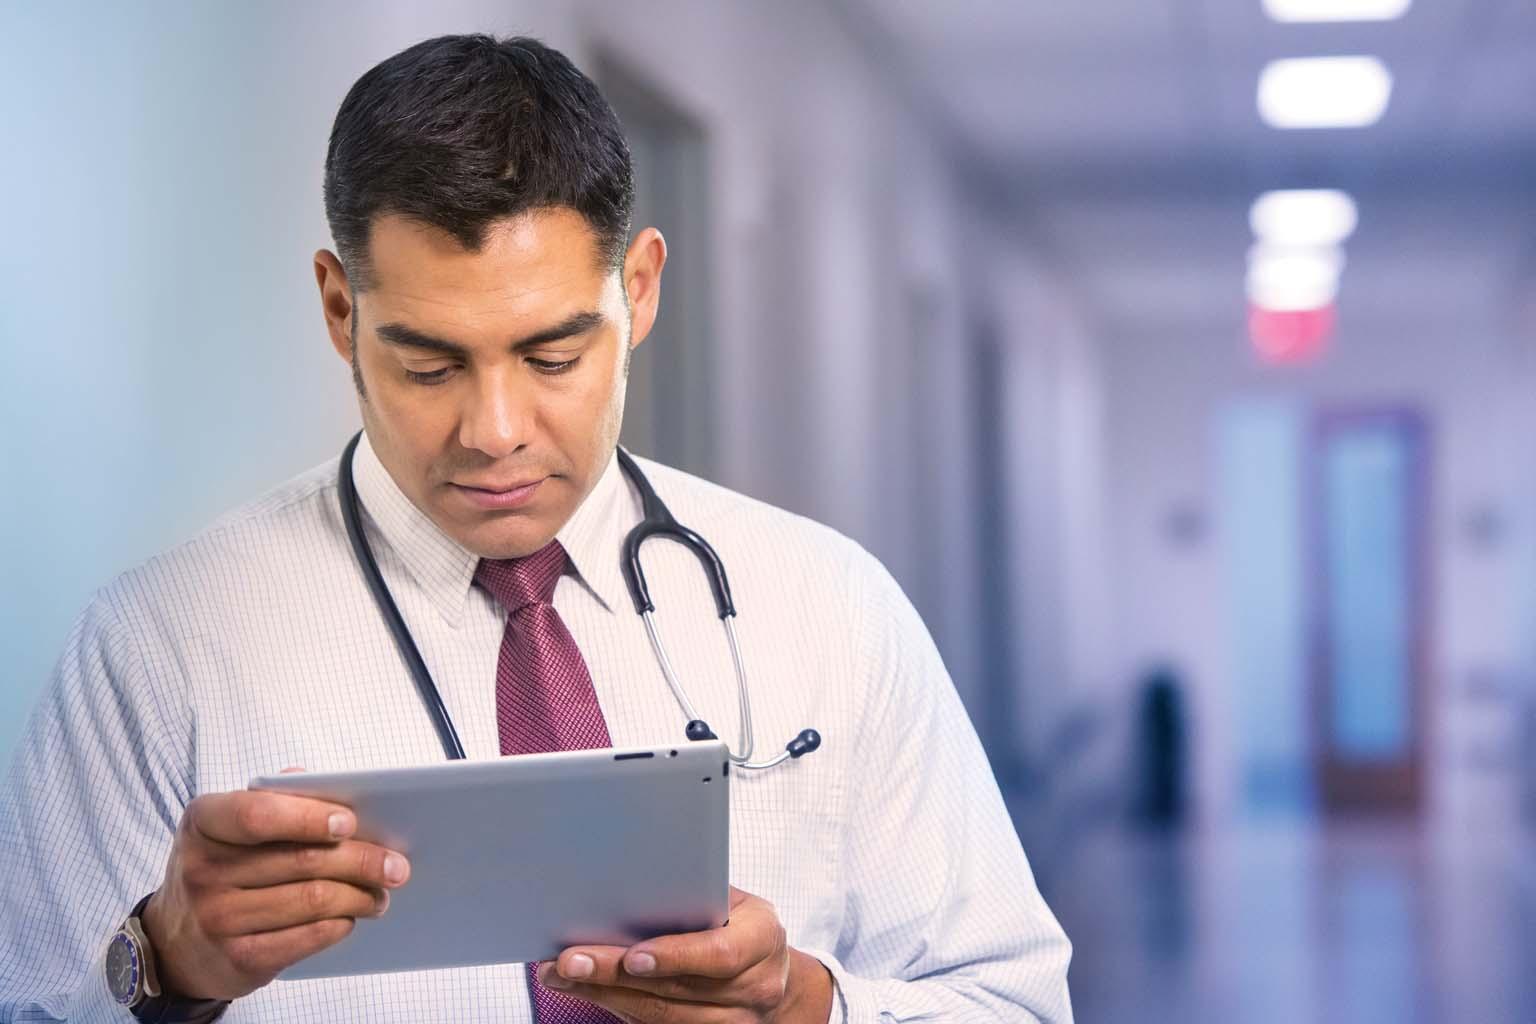 doctor paused in hallway looking at tablet